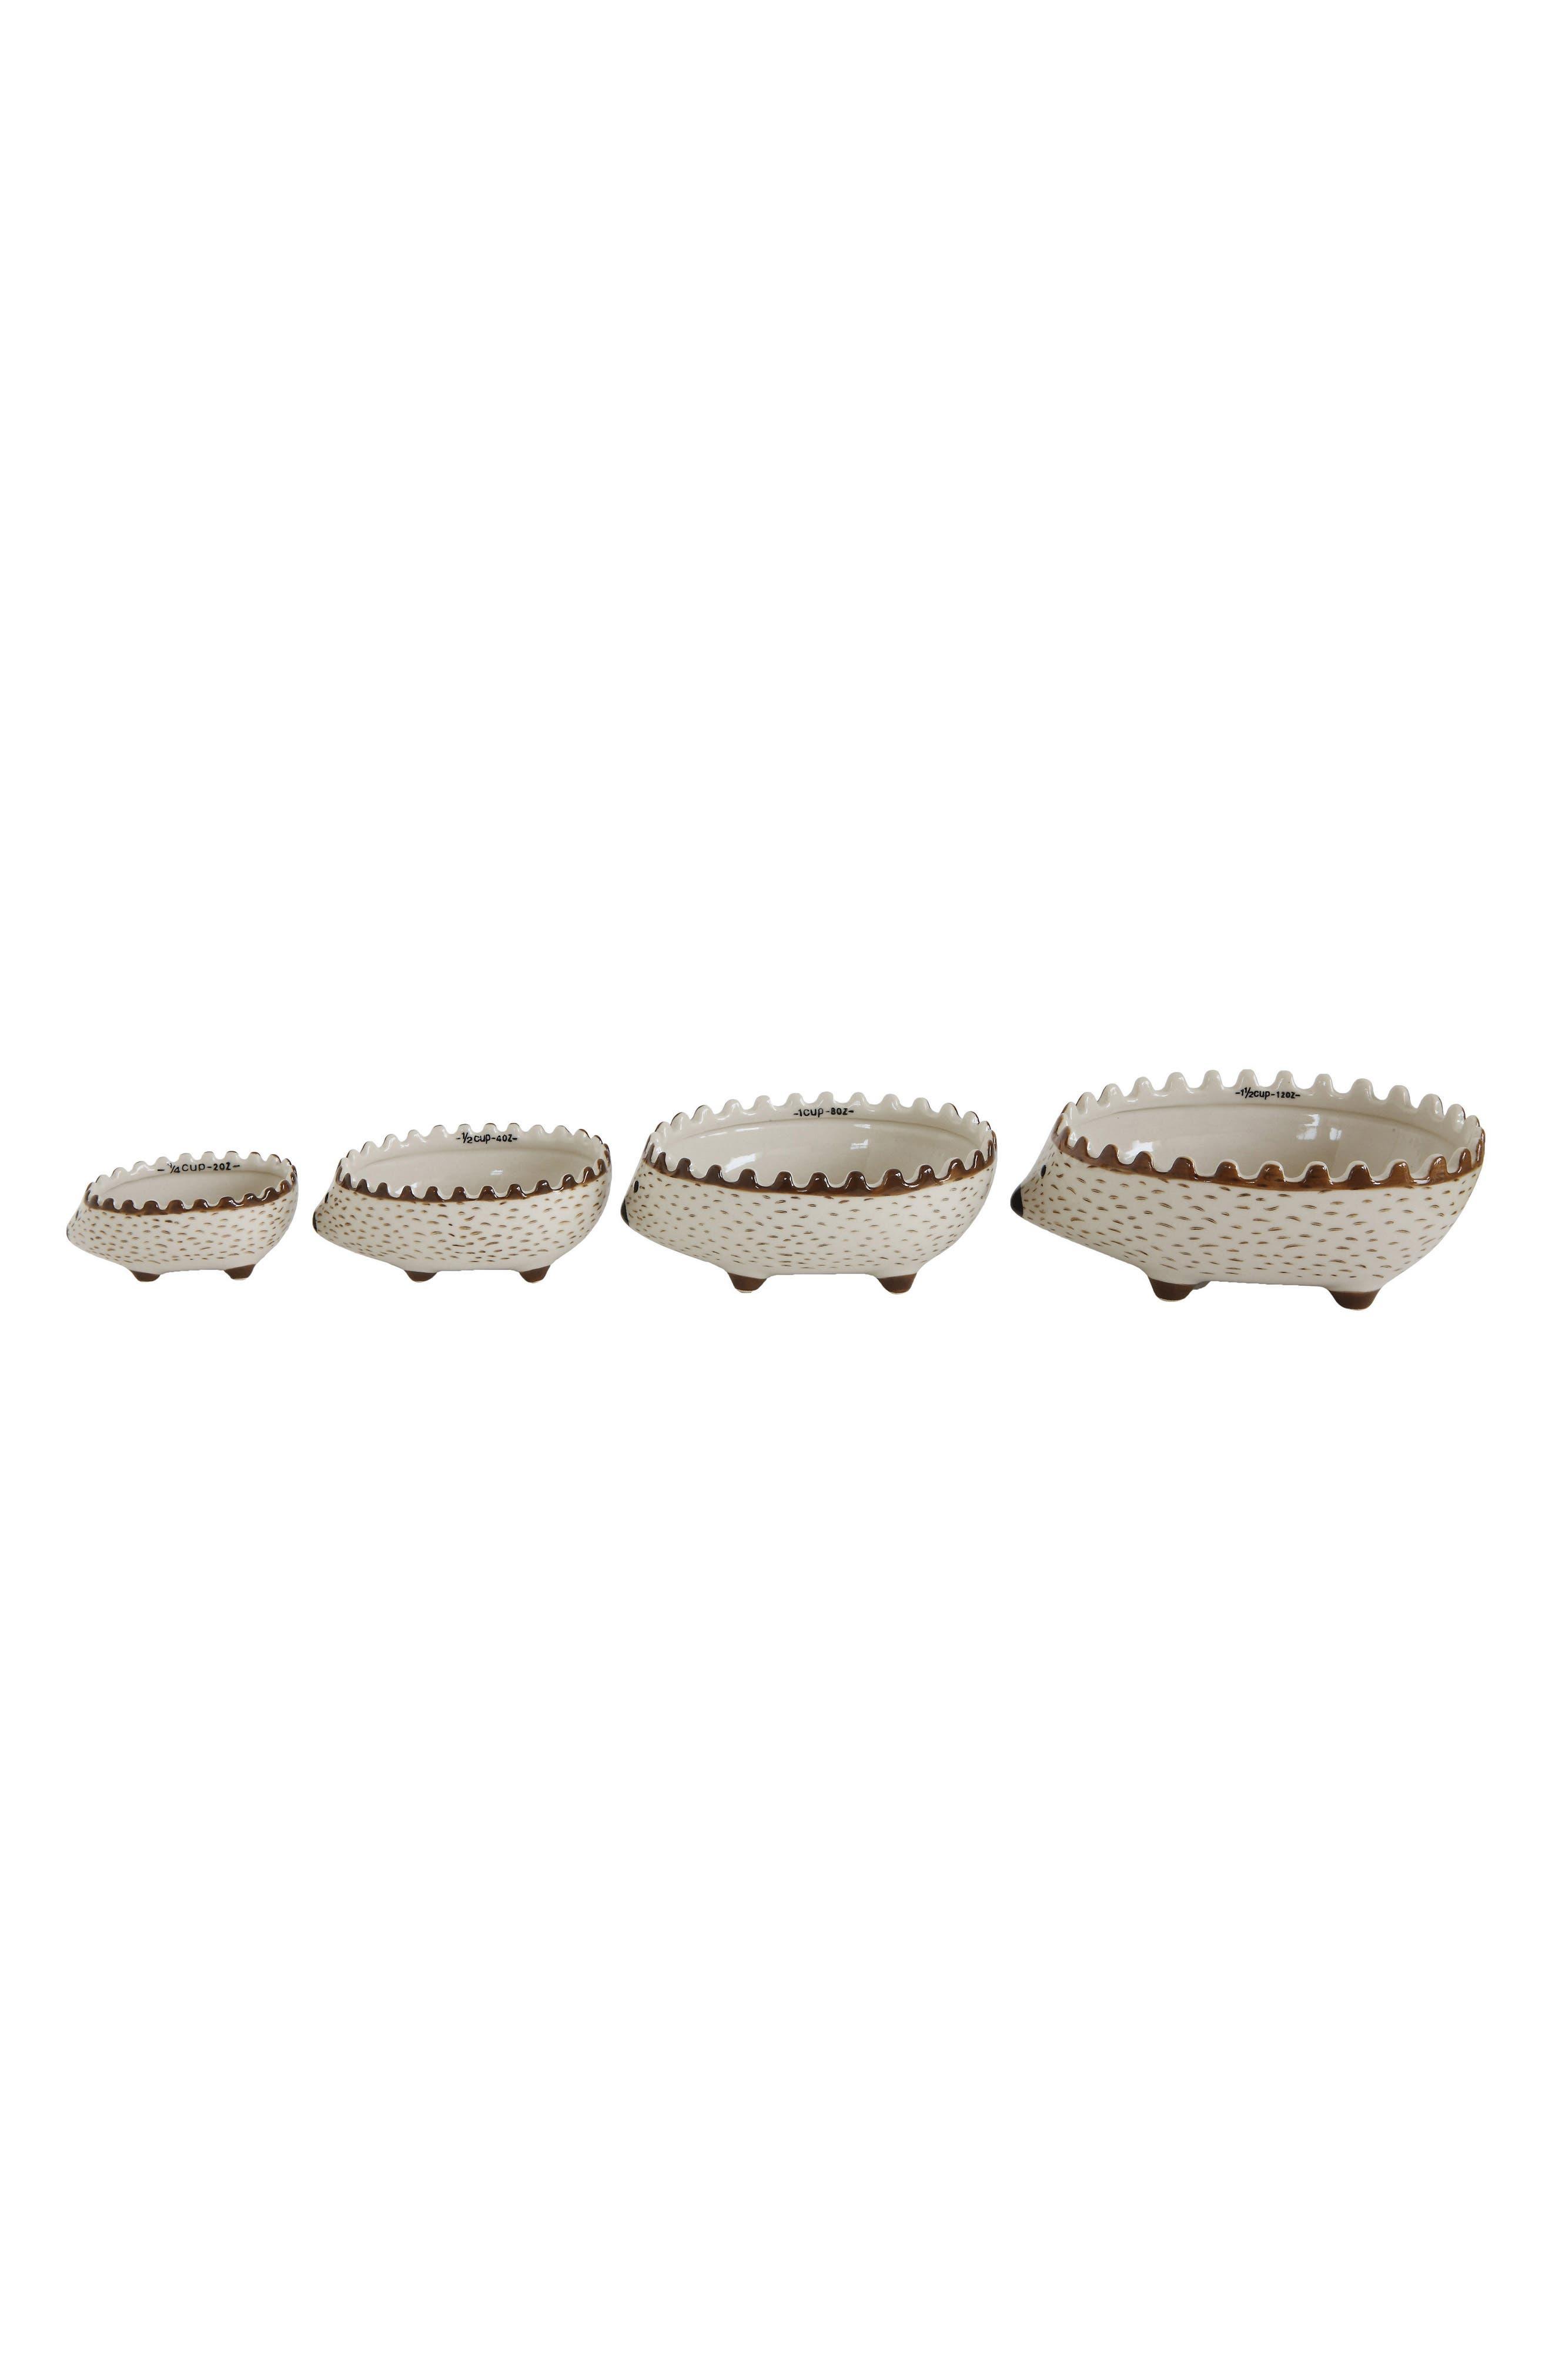 Set of 4 Hedgehog Measuring Cups,                         Main,                         color, 100